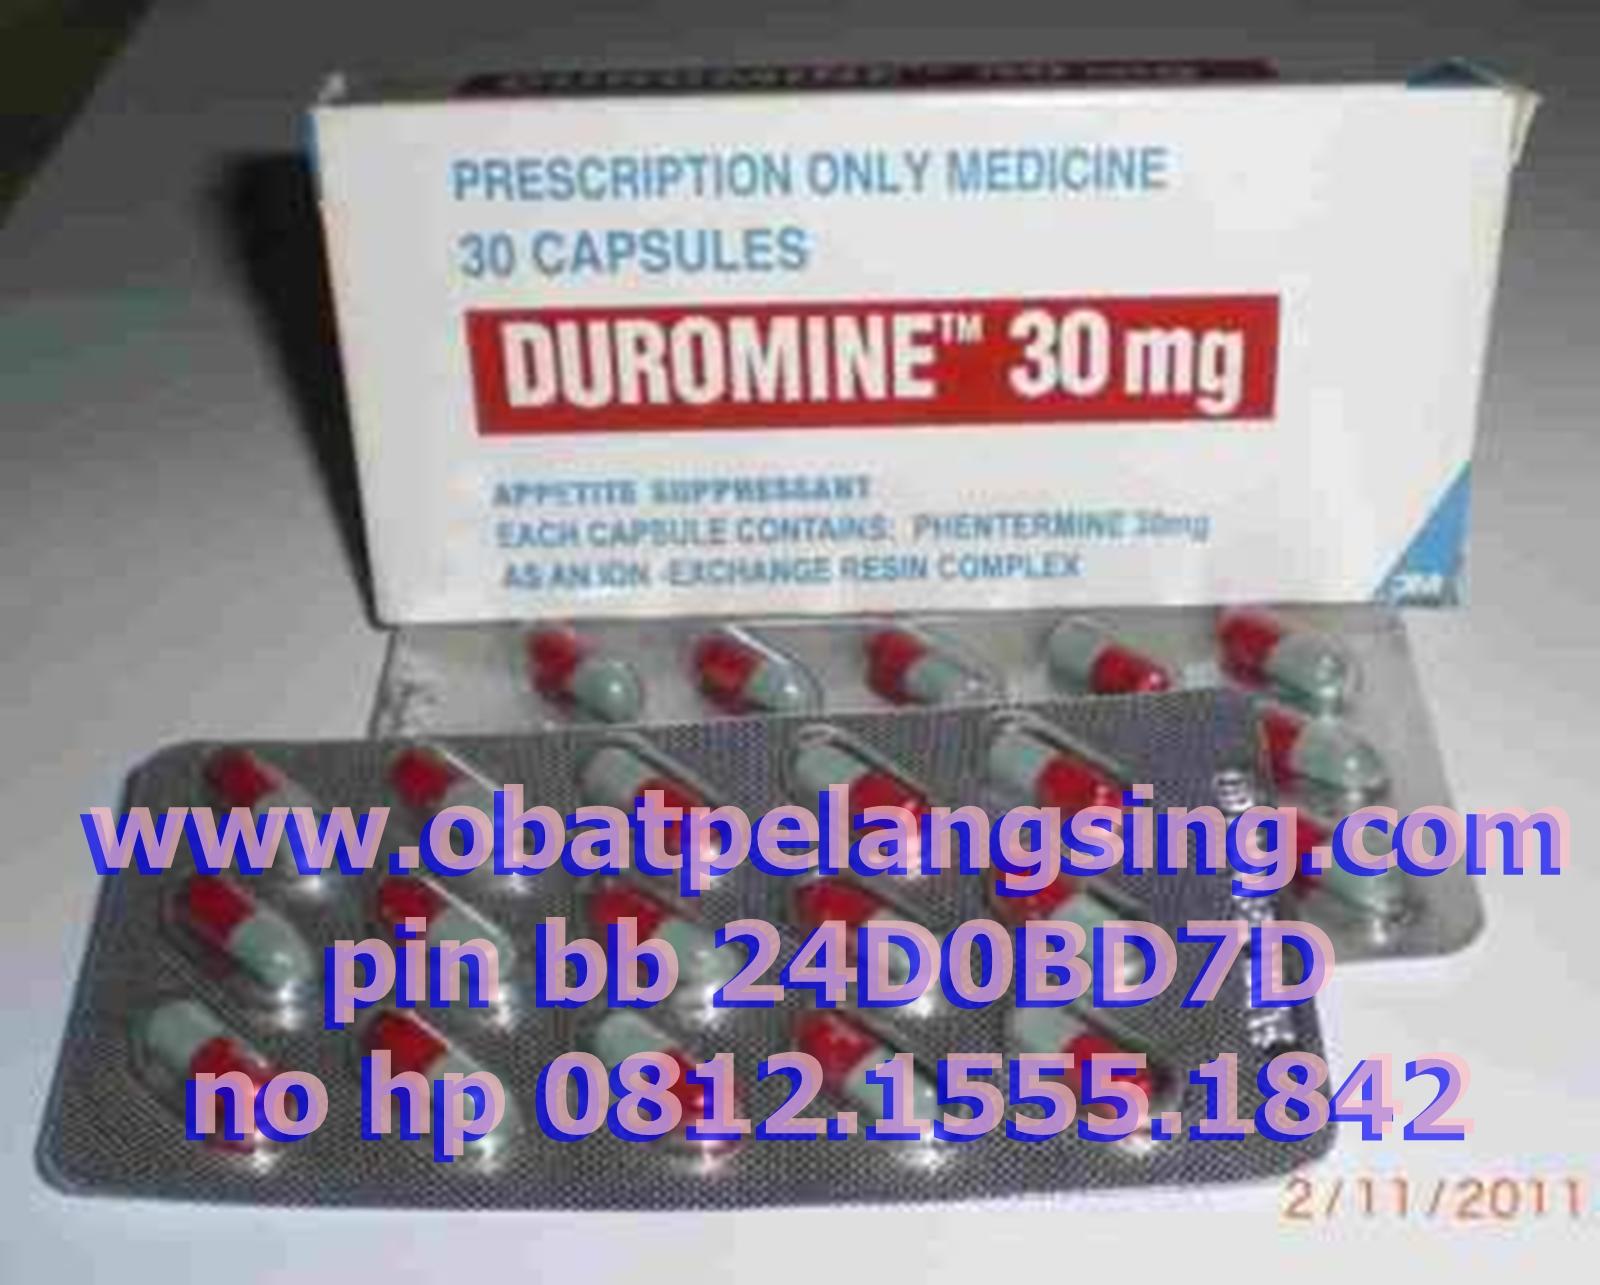 obatpelangsing